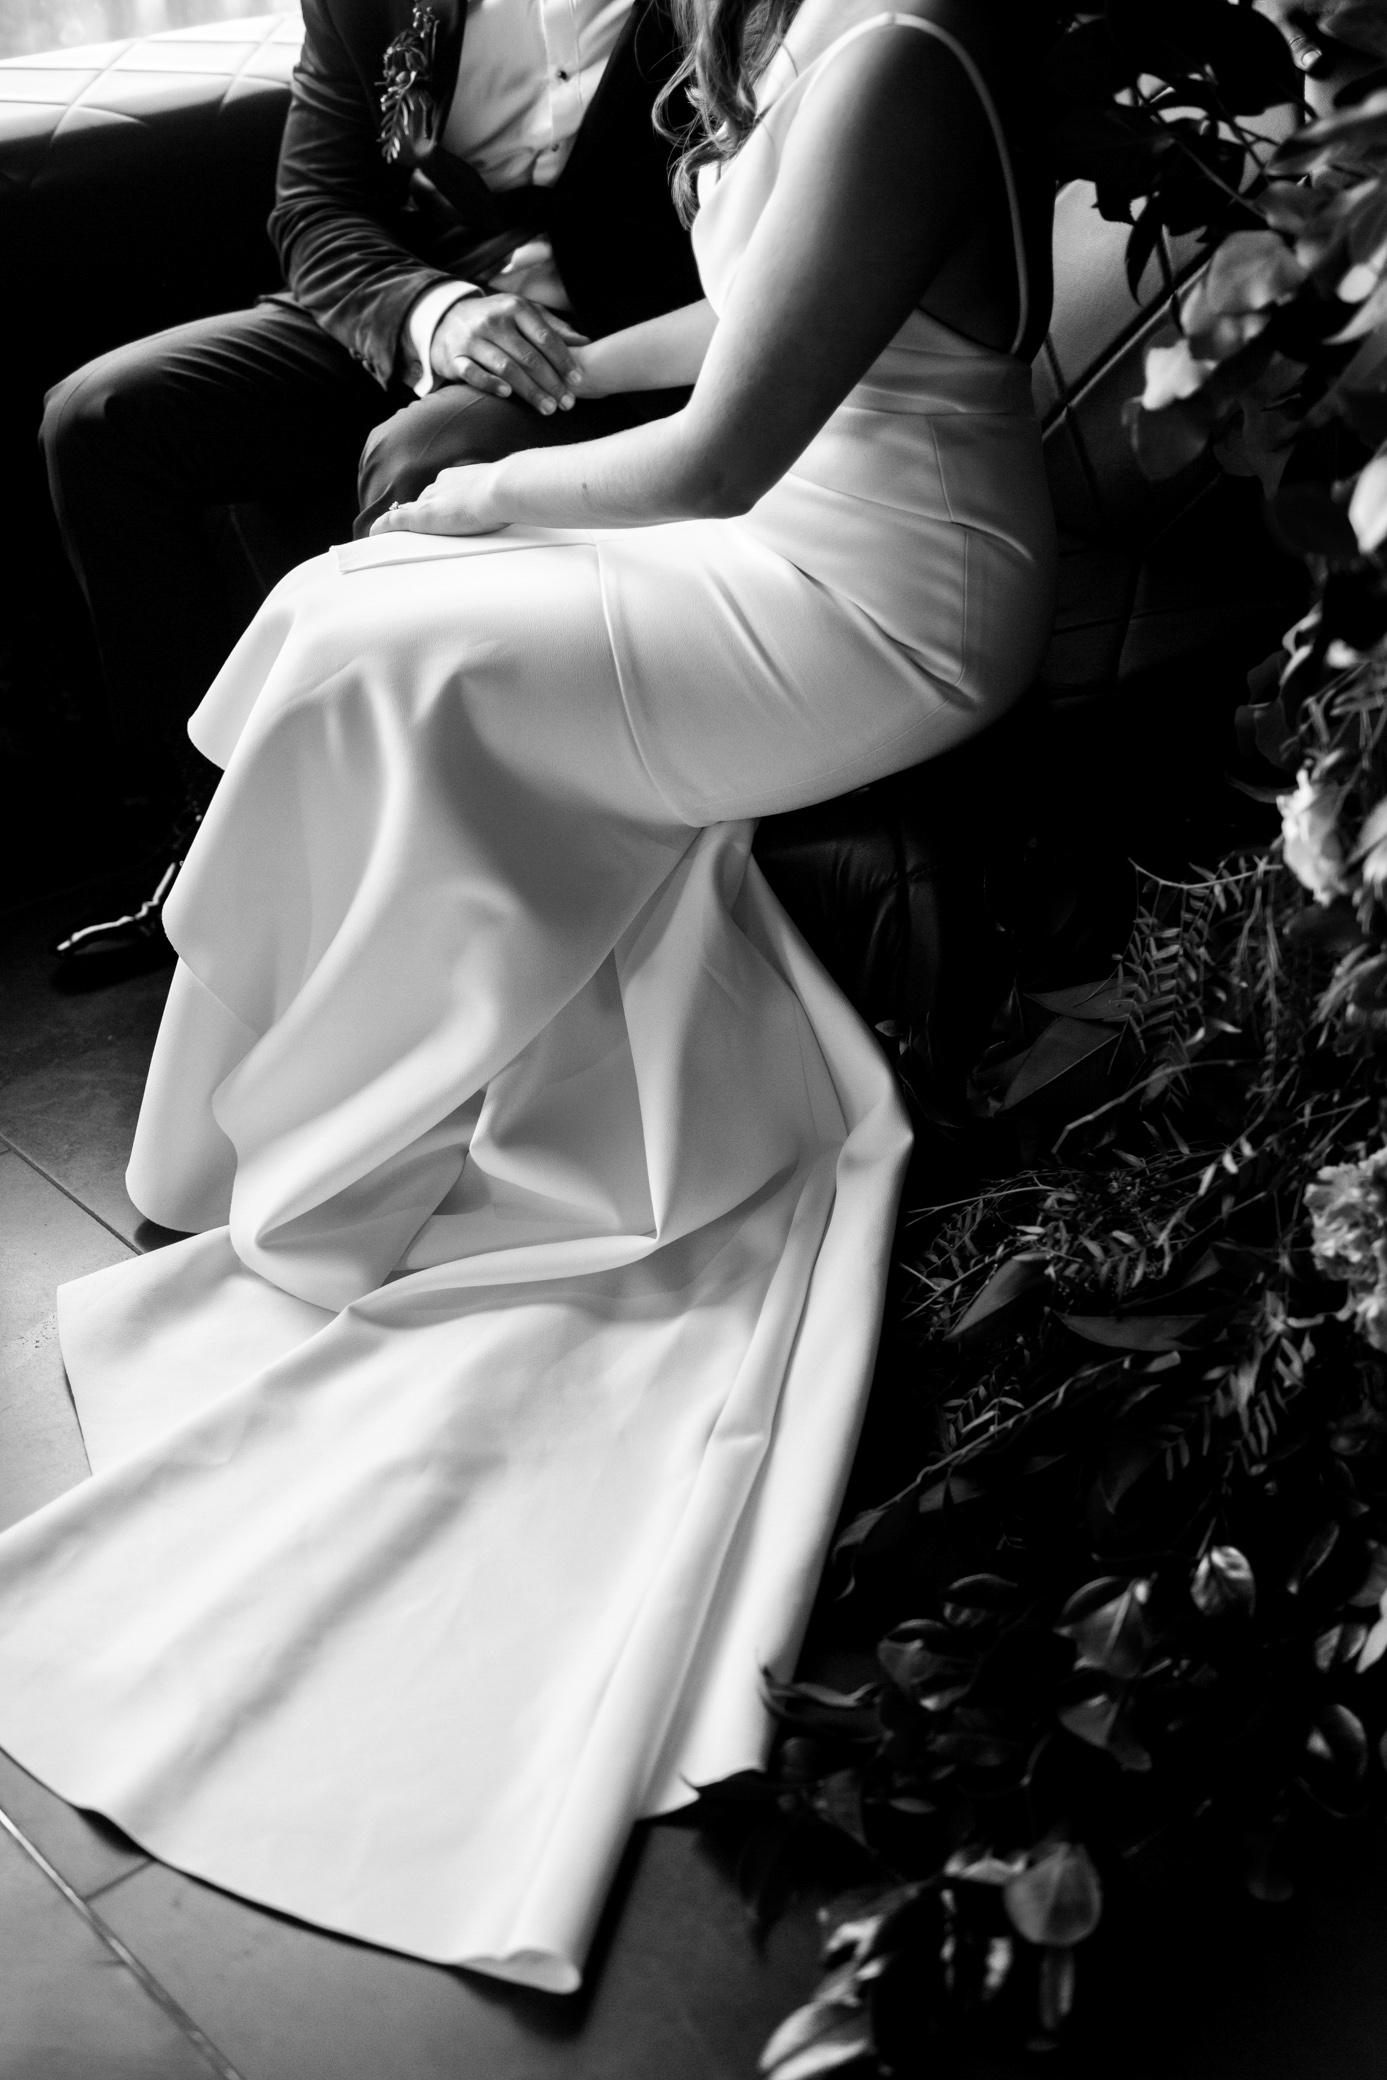 mr-theodore_white-vine-photography_same-sex-wedding-directory21.jpg